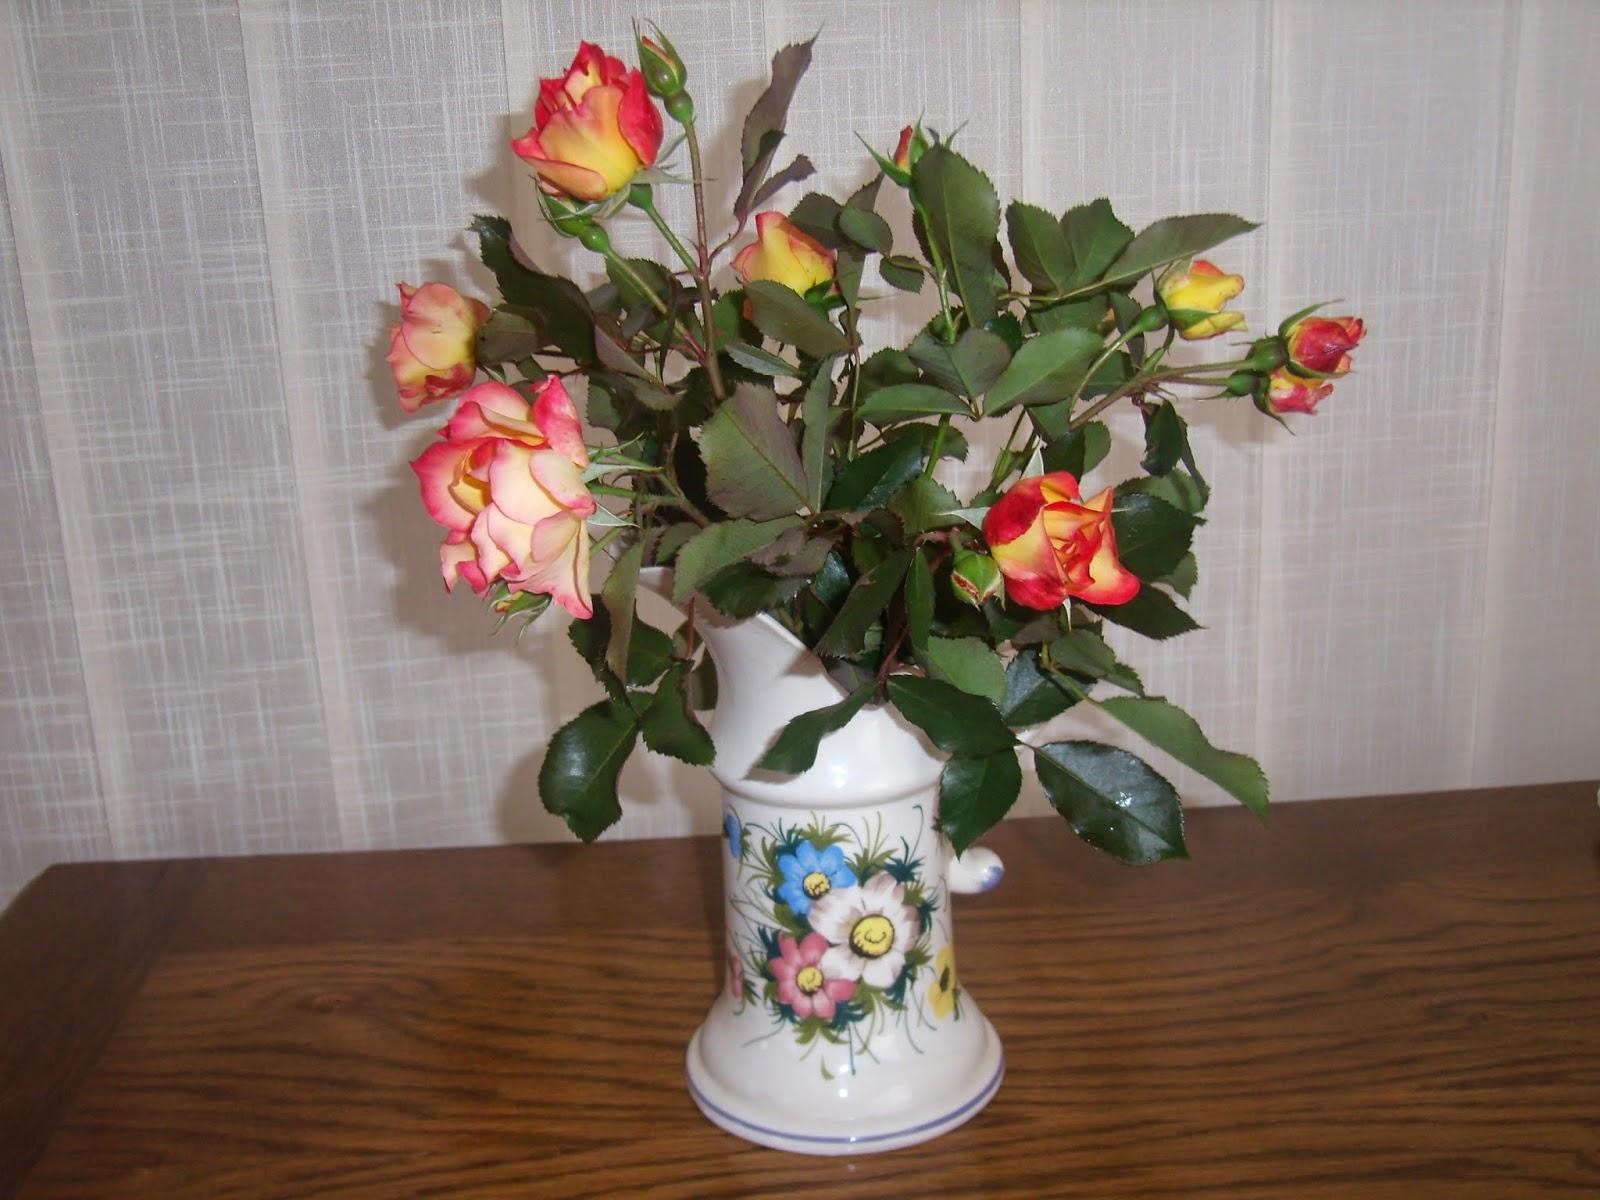 le blog des 3 filles conserver les roses coupees. Black Bedroom Furniture Sets. Home Design Ideas